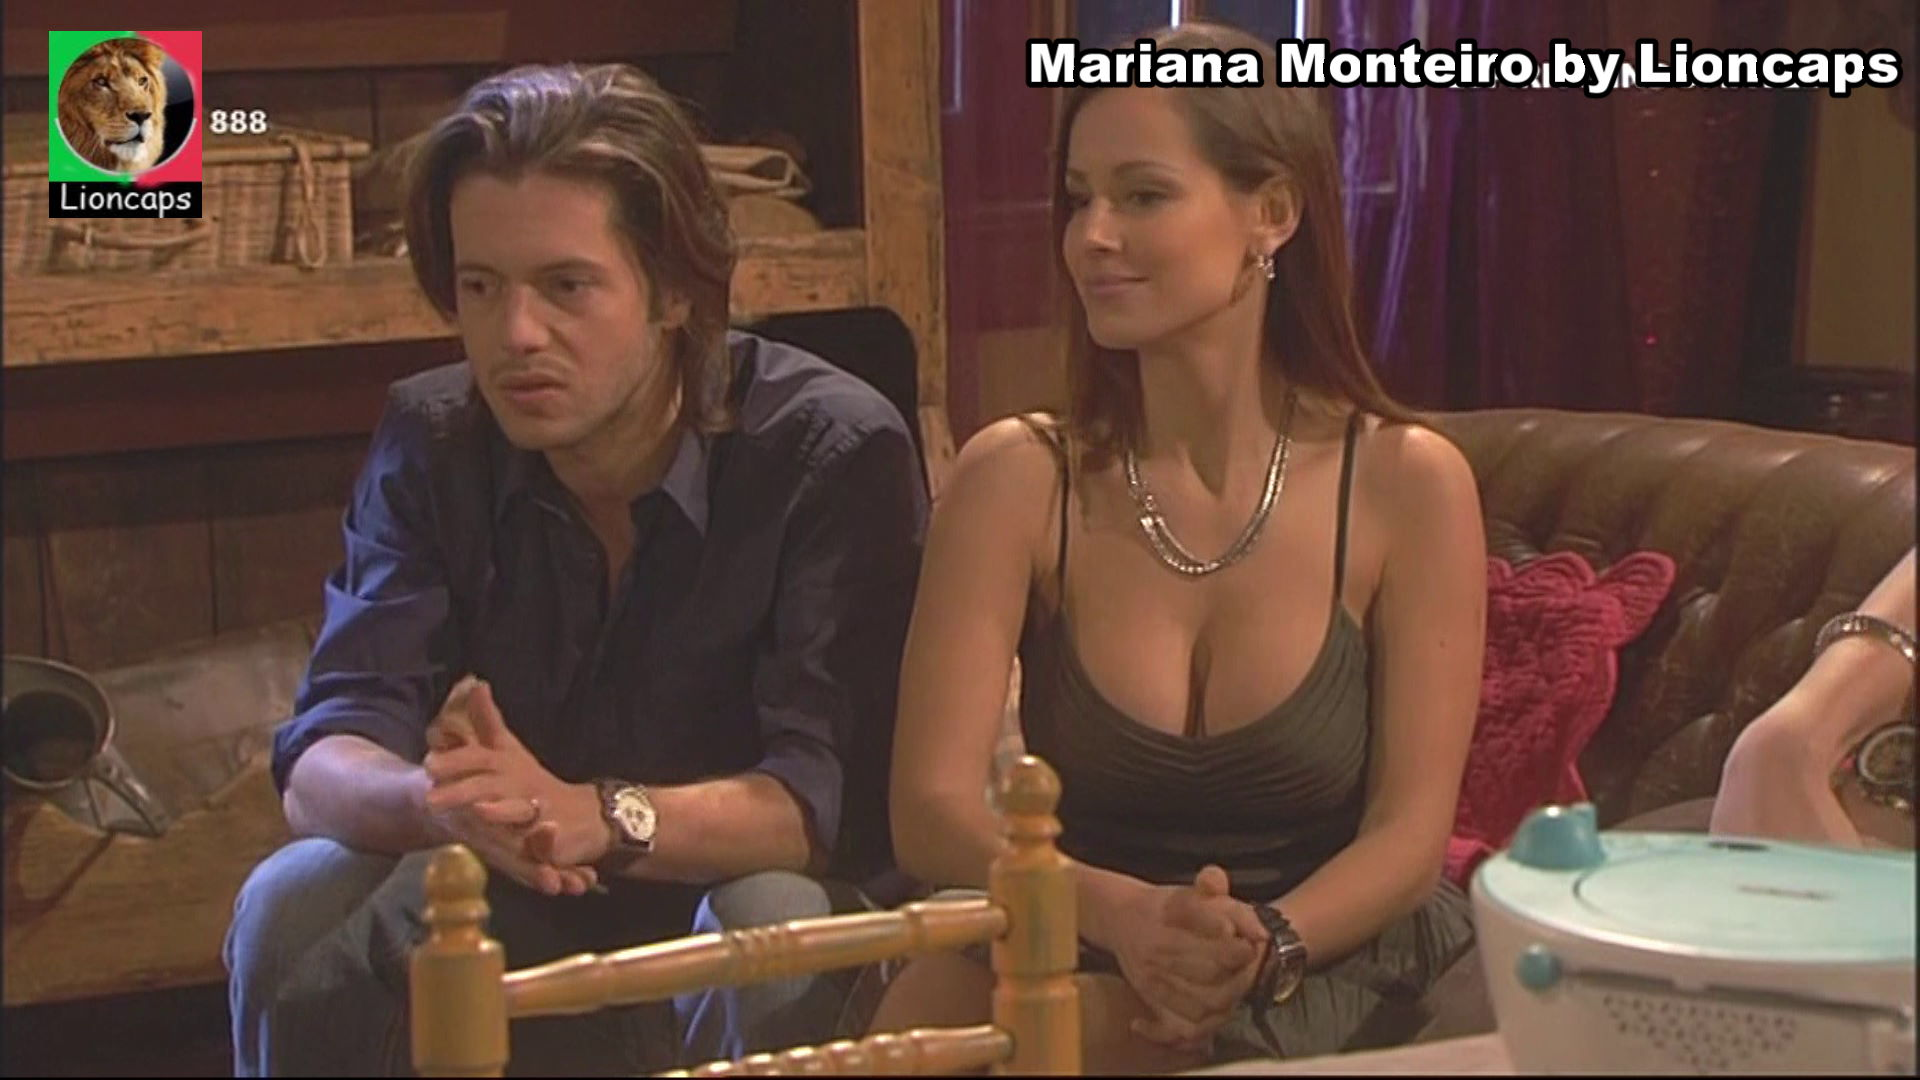 738387198_mariana_monteiro_vs190209_19217_122_336lo.JPG